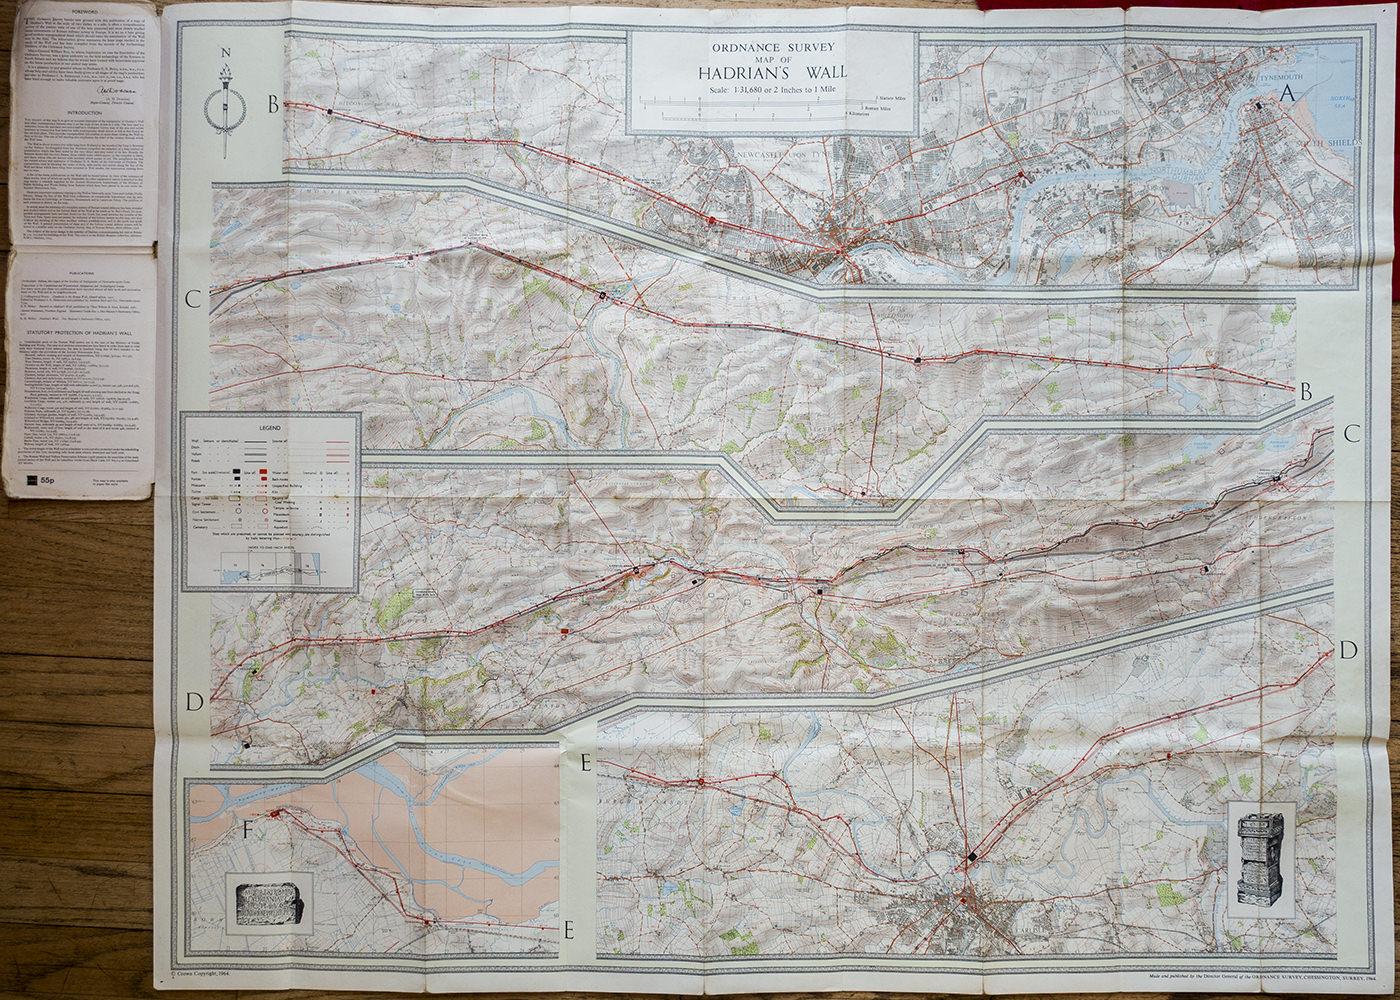 hadrians-wall-map-unfolded.jpg